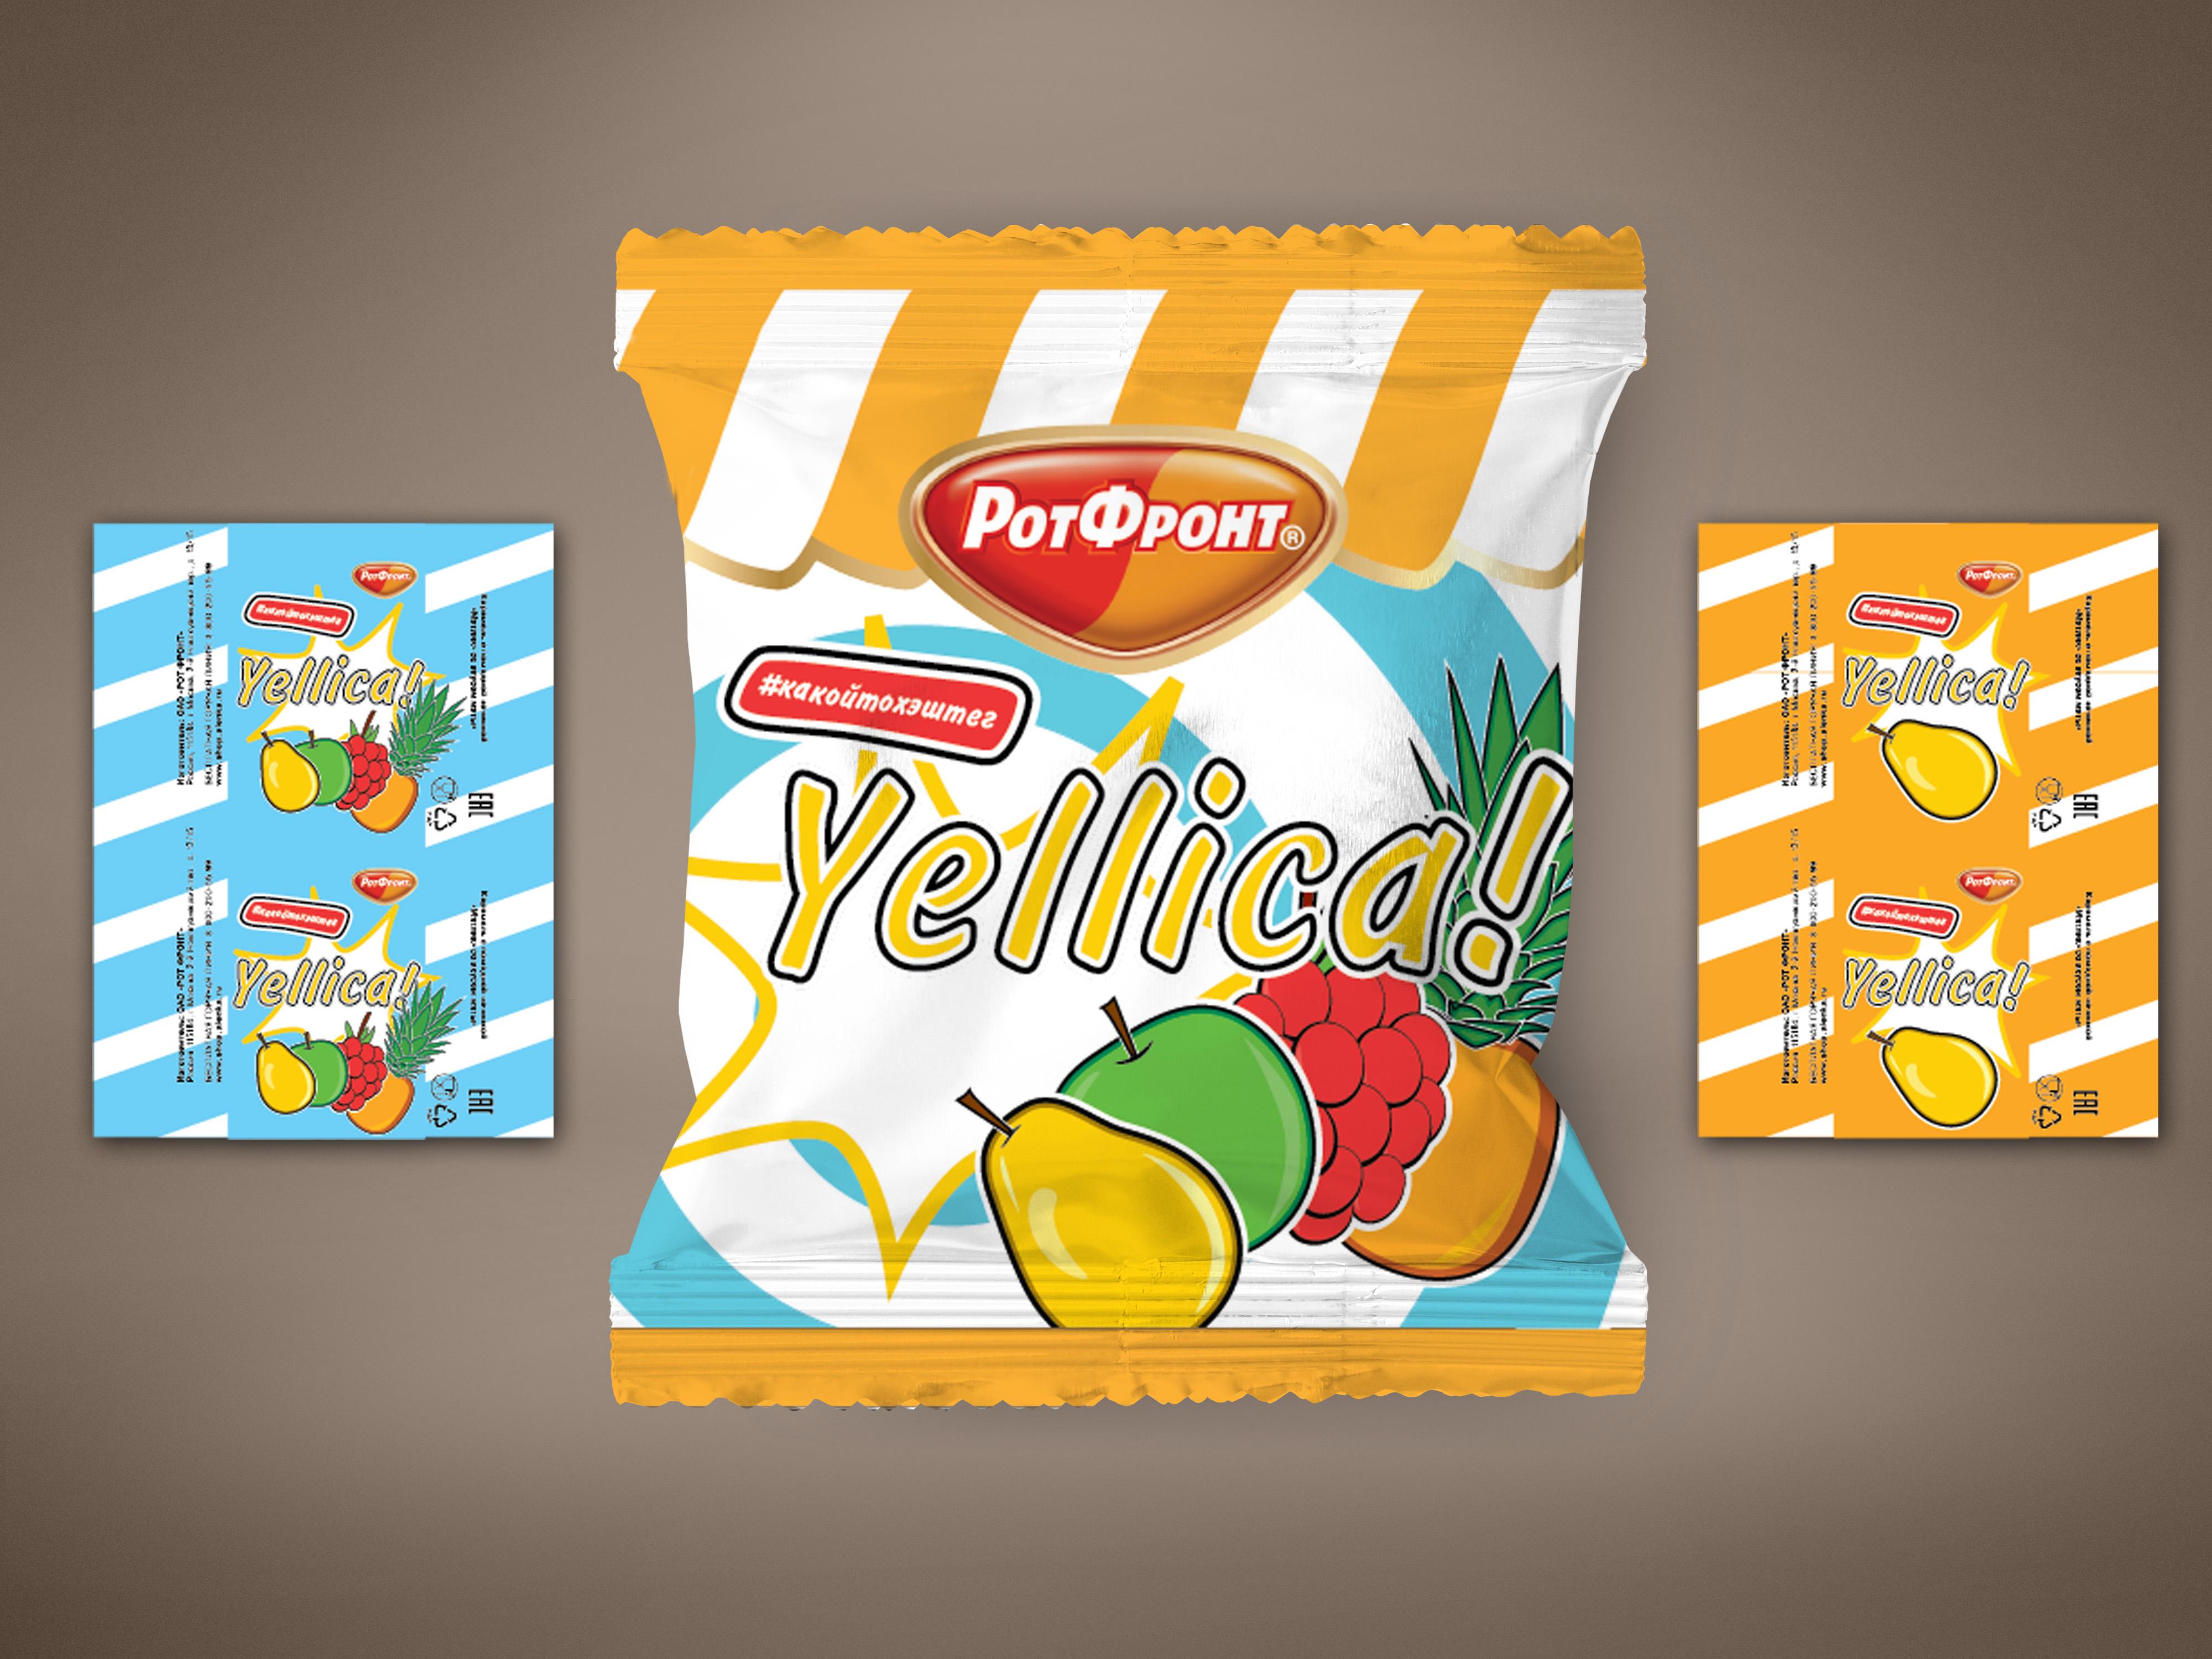 Разработка дизайна упаковки для желейных конфет от Рот Фронт фото f_3525a54b6856e887.jpg